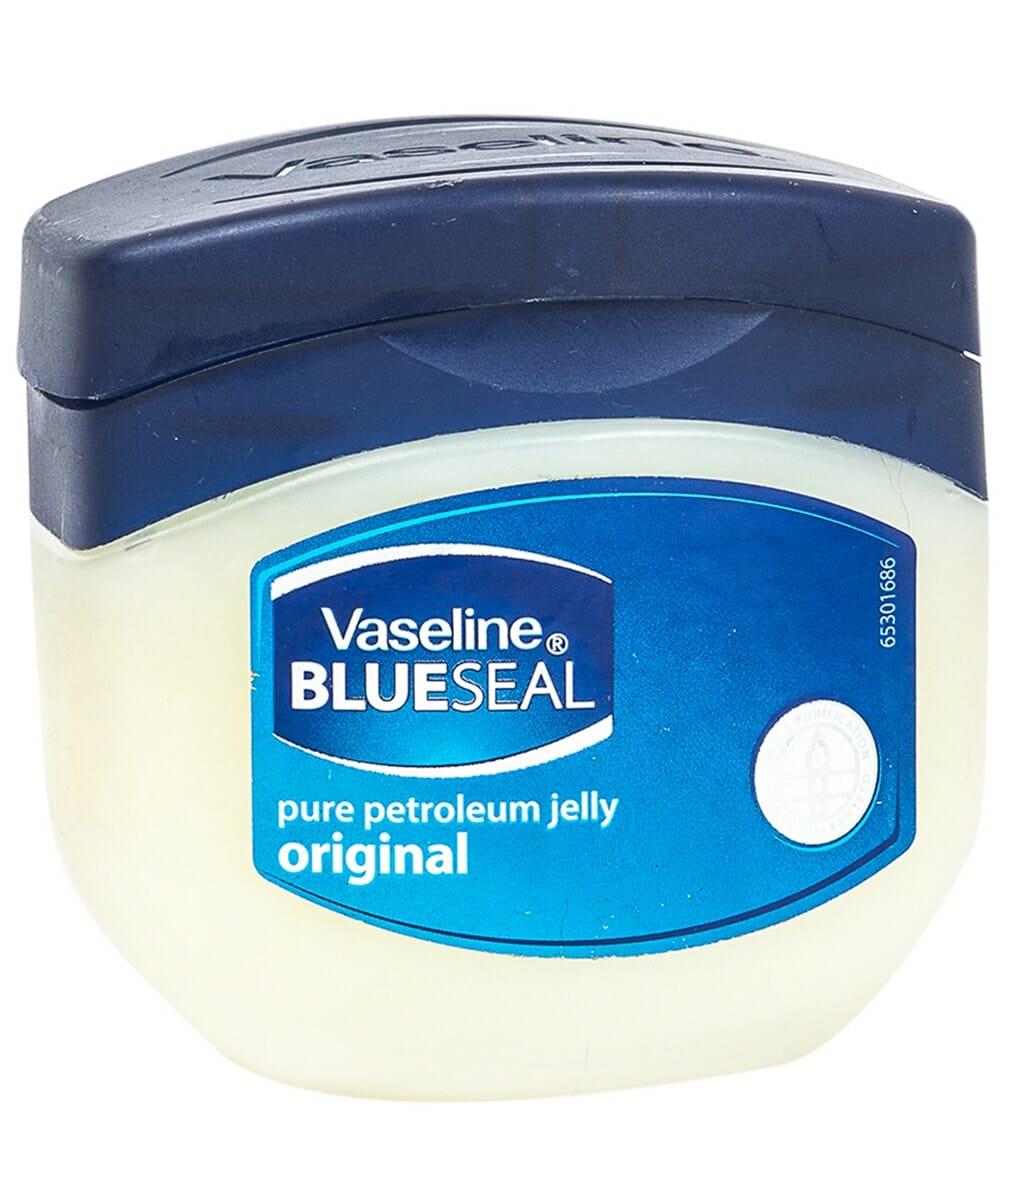 Vaseline Pure Petroleum Jelly Original 250g